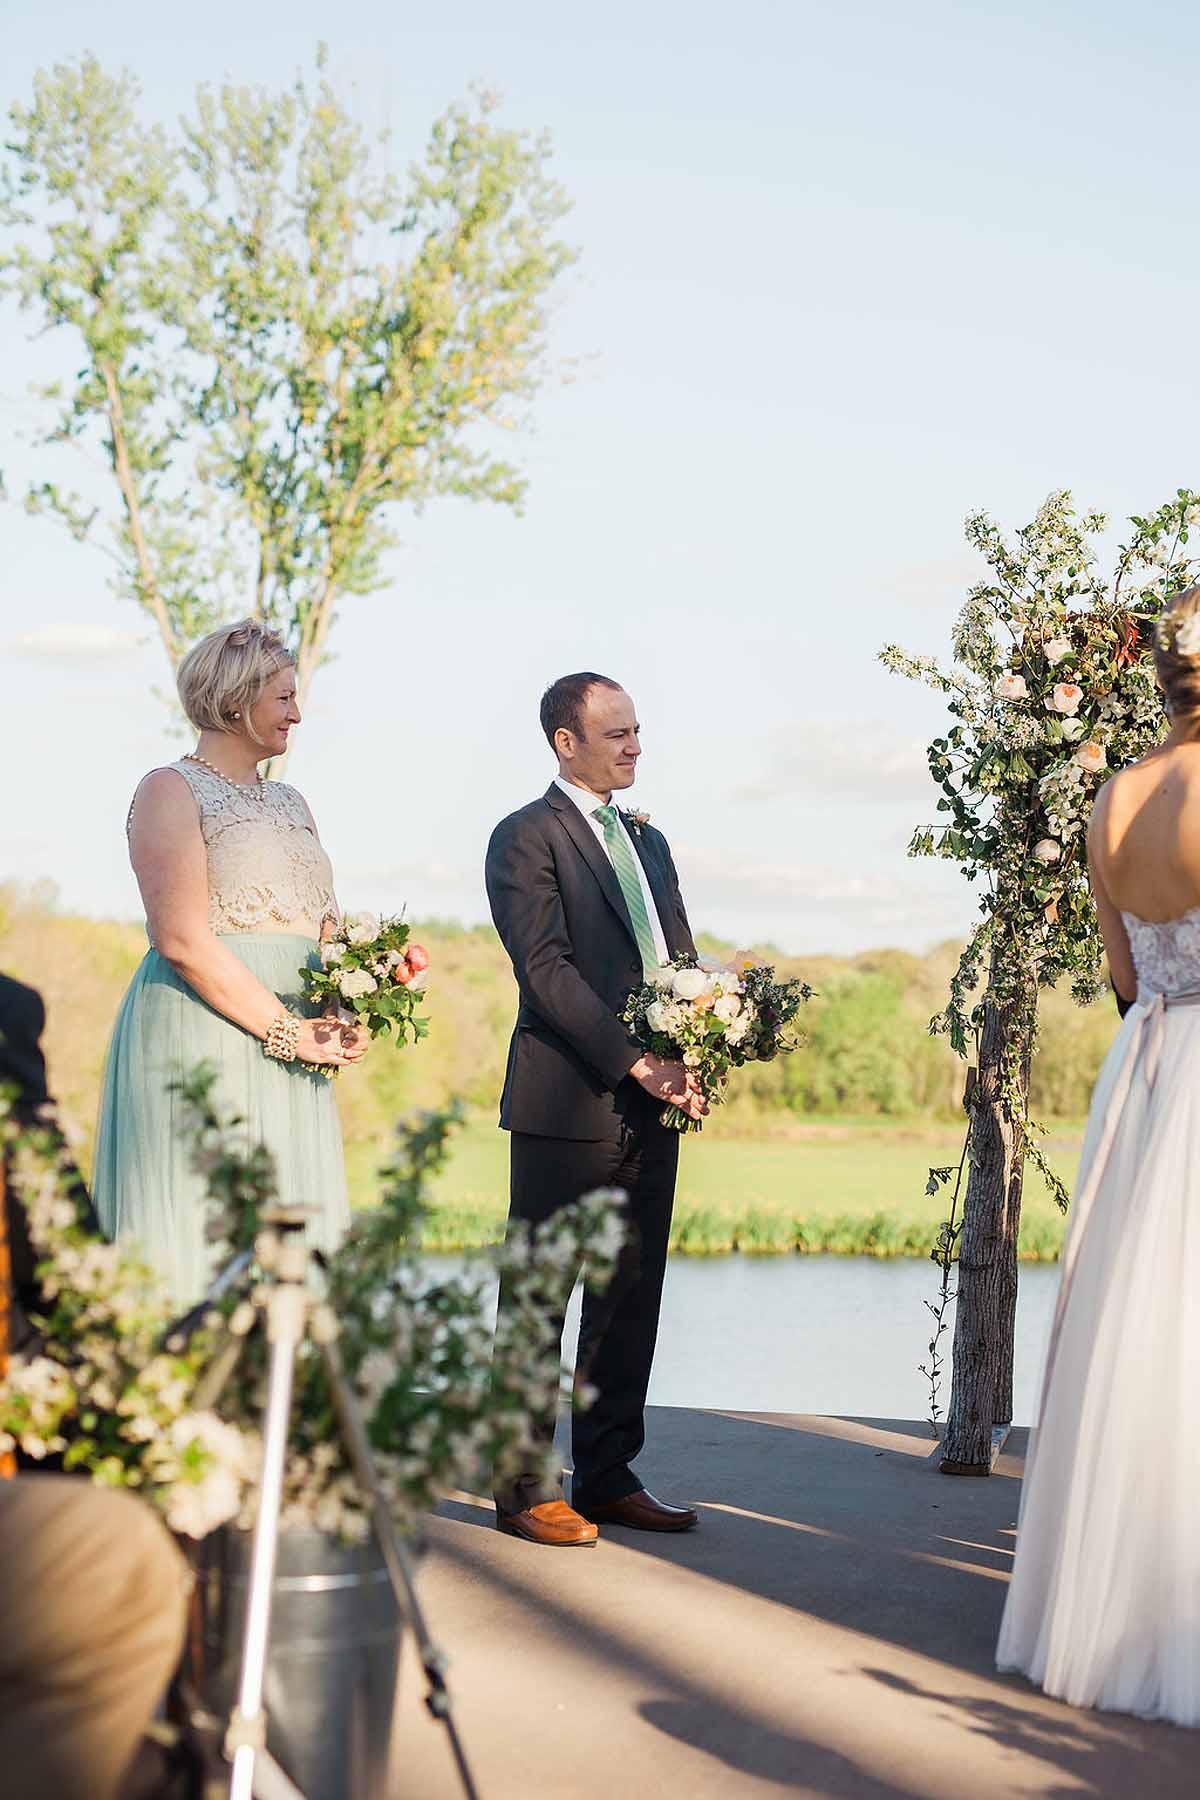 Riverside on the Potomac wedding photo 24